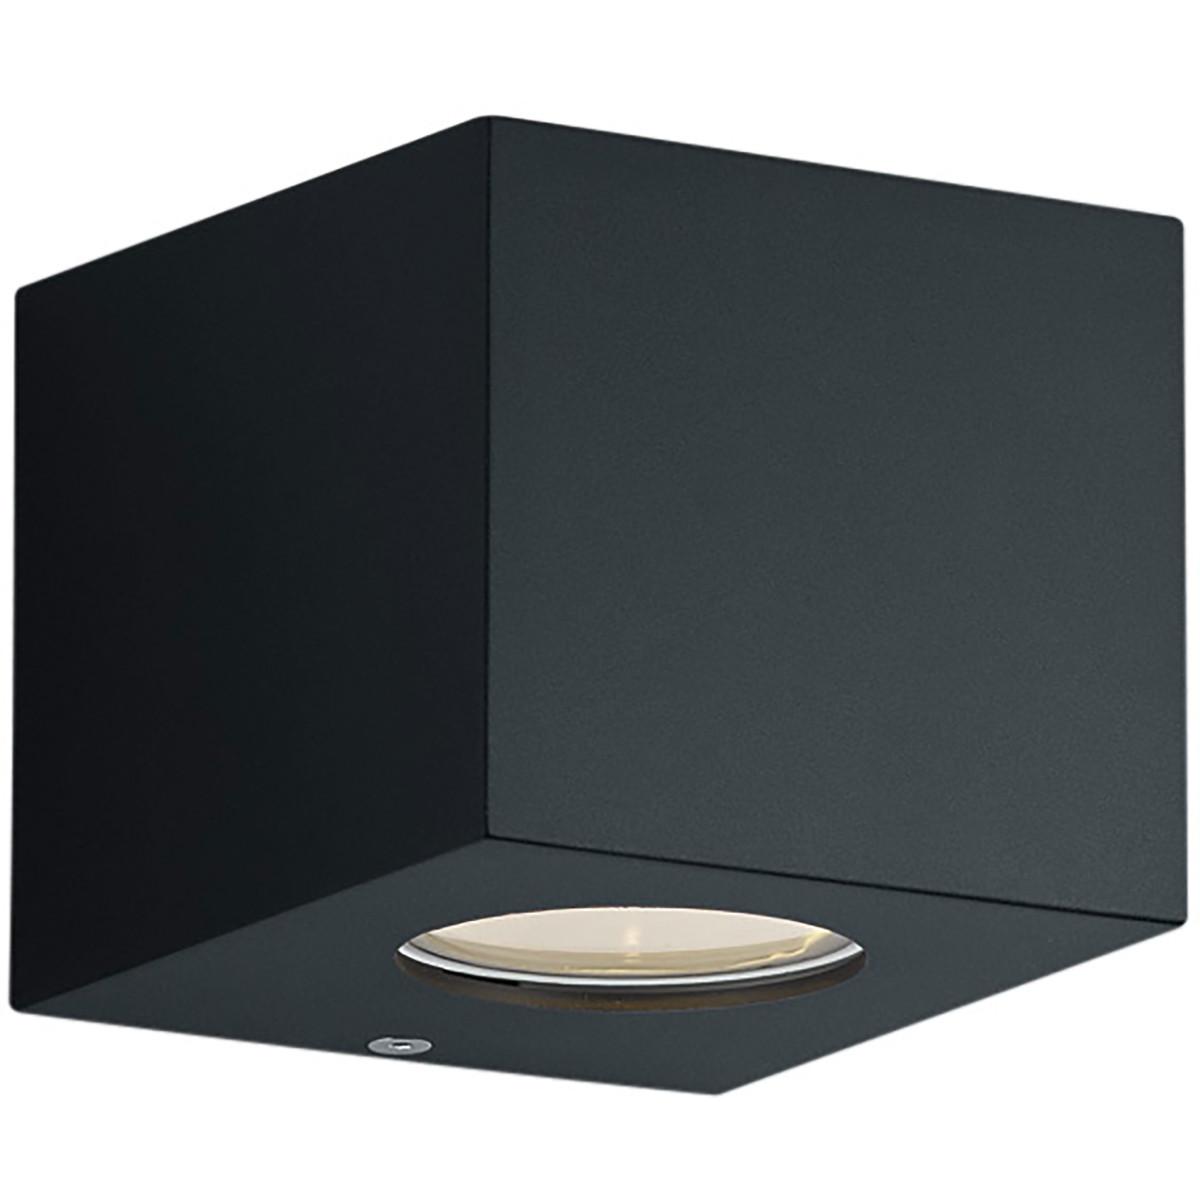 LED Tuinverlichting - Tuinlamp - Trion Corby - Wand - 4W - Mat Zwart - Kunststof